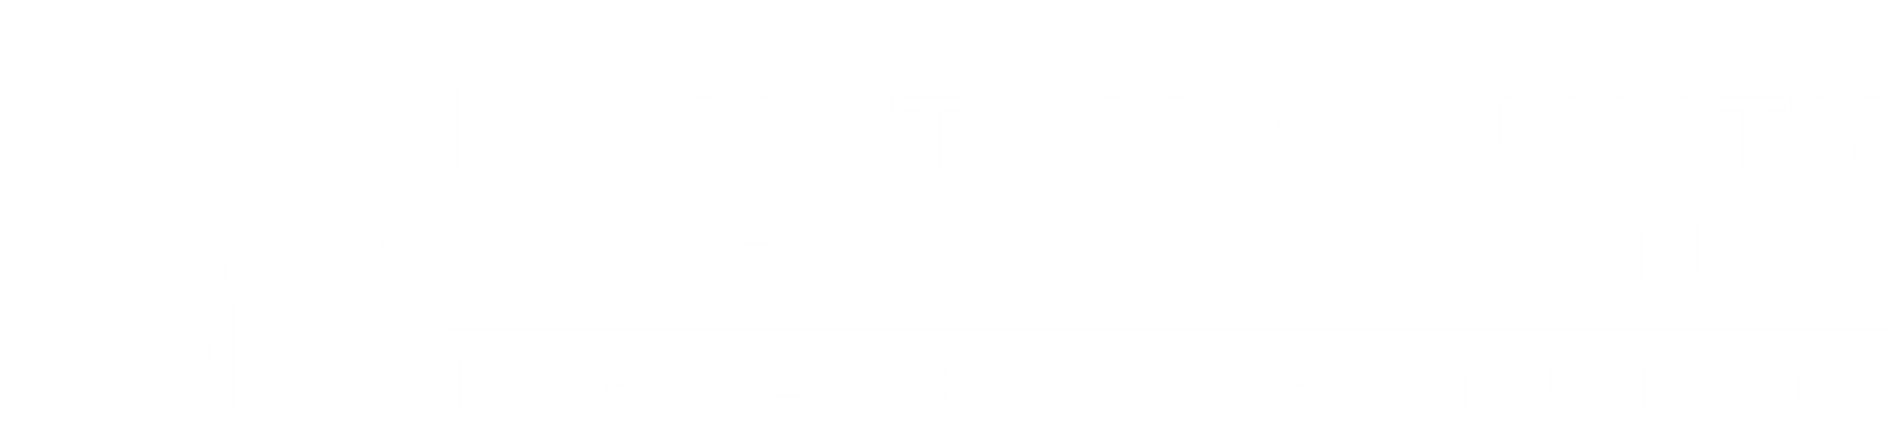 Calendar - Houston County Schools Regarding Houston Countyboard Of Education Calendar 2021